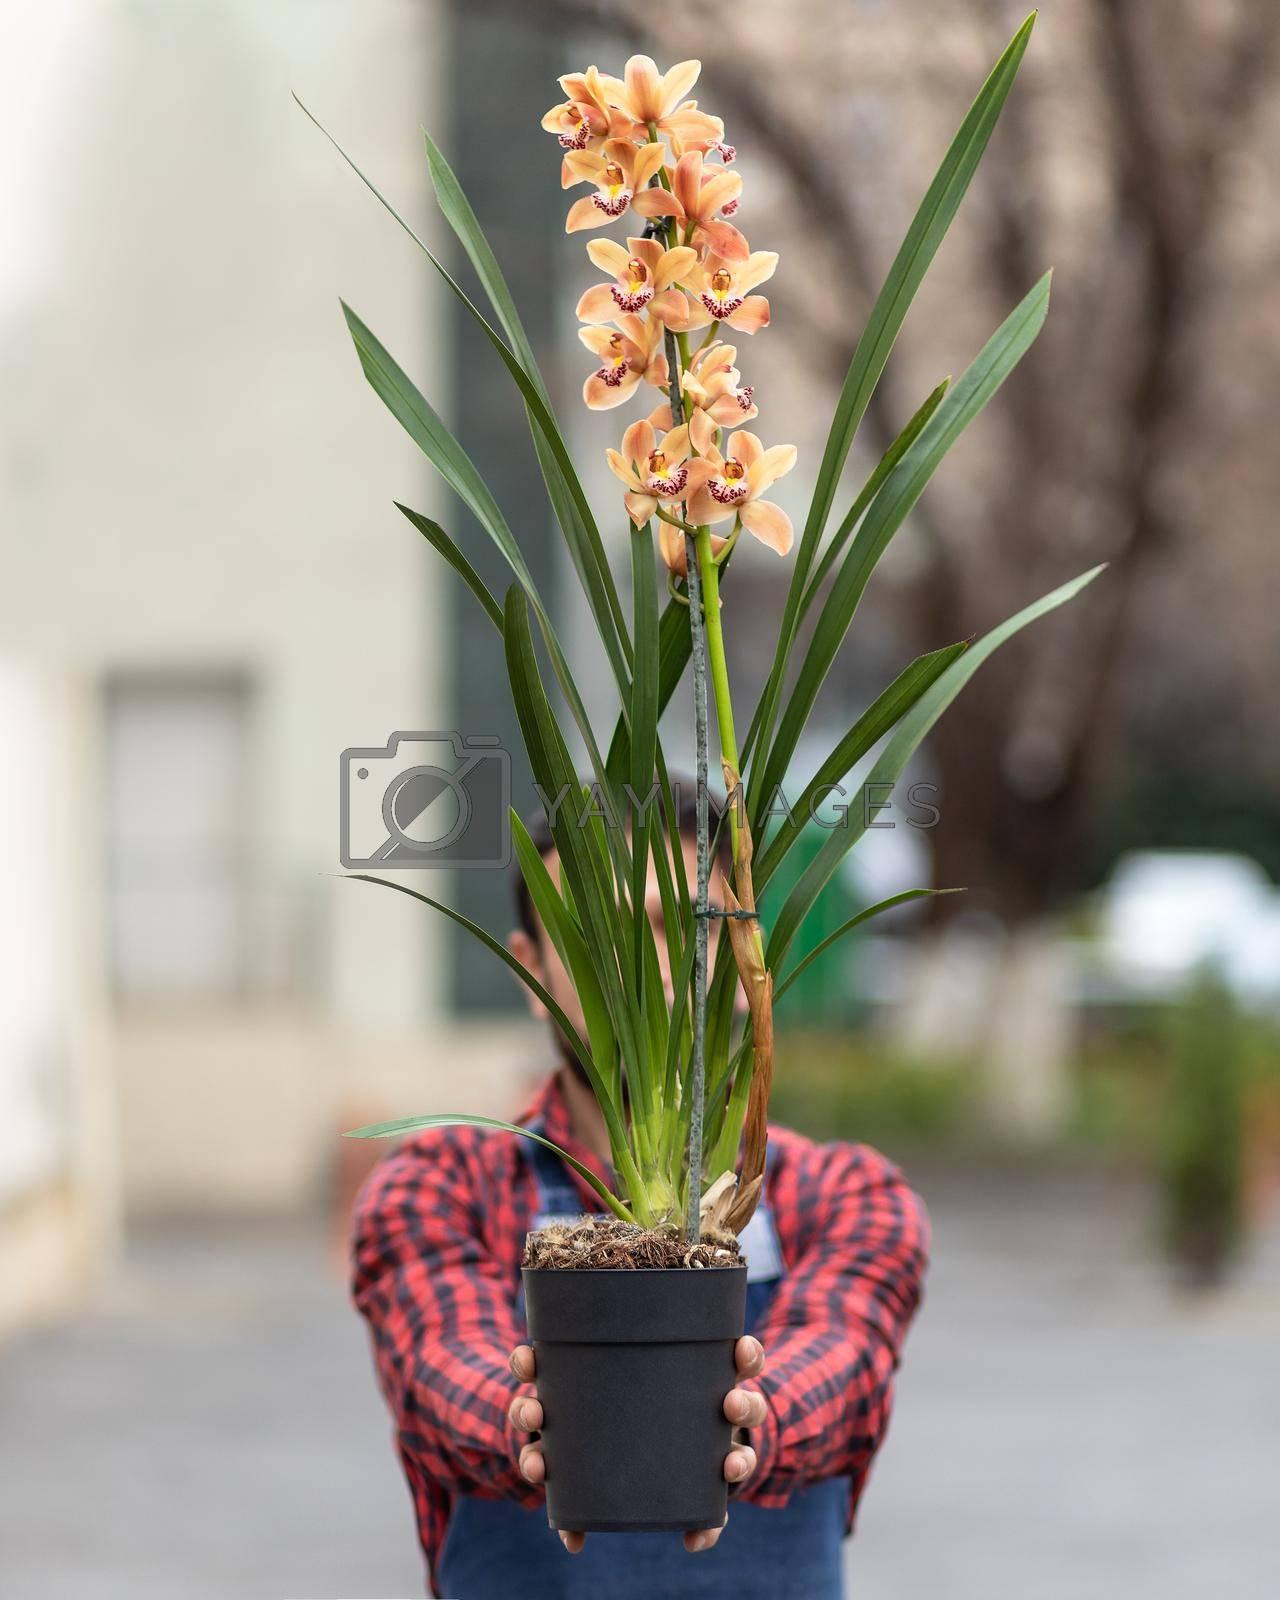 Man holding boat orchid, cymbidium in the pot